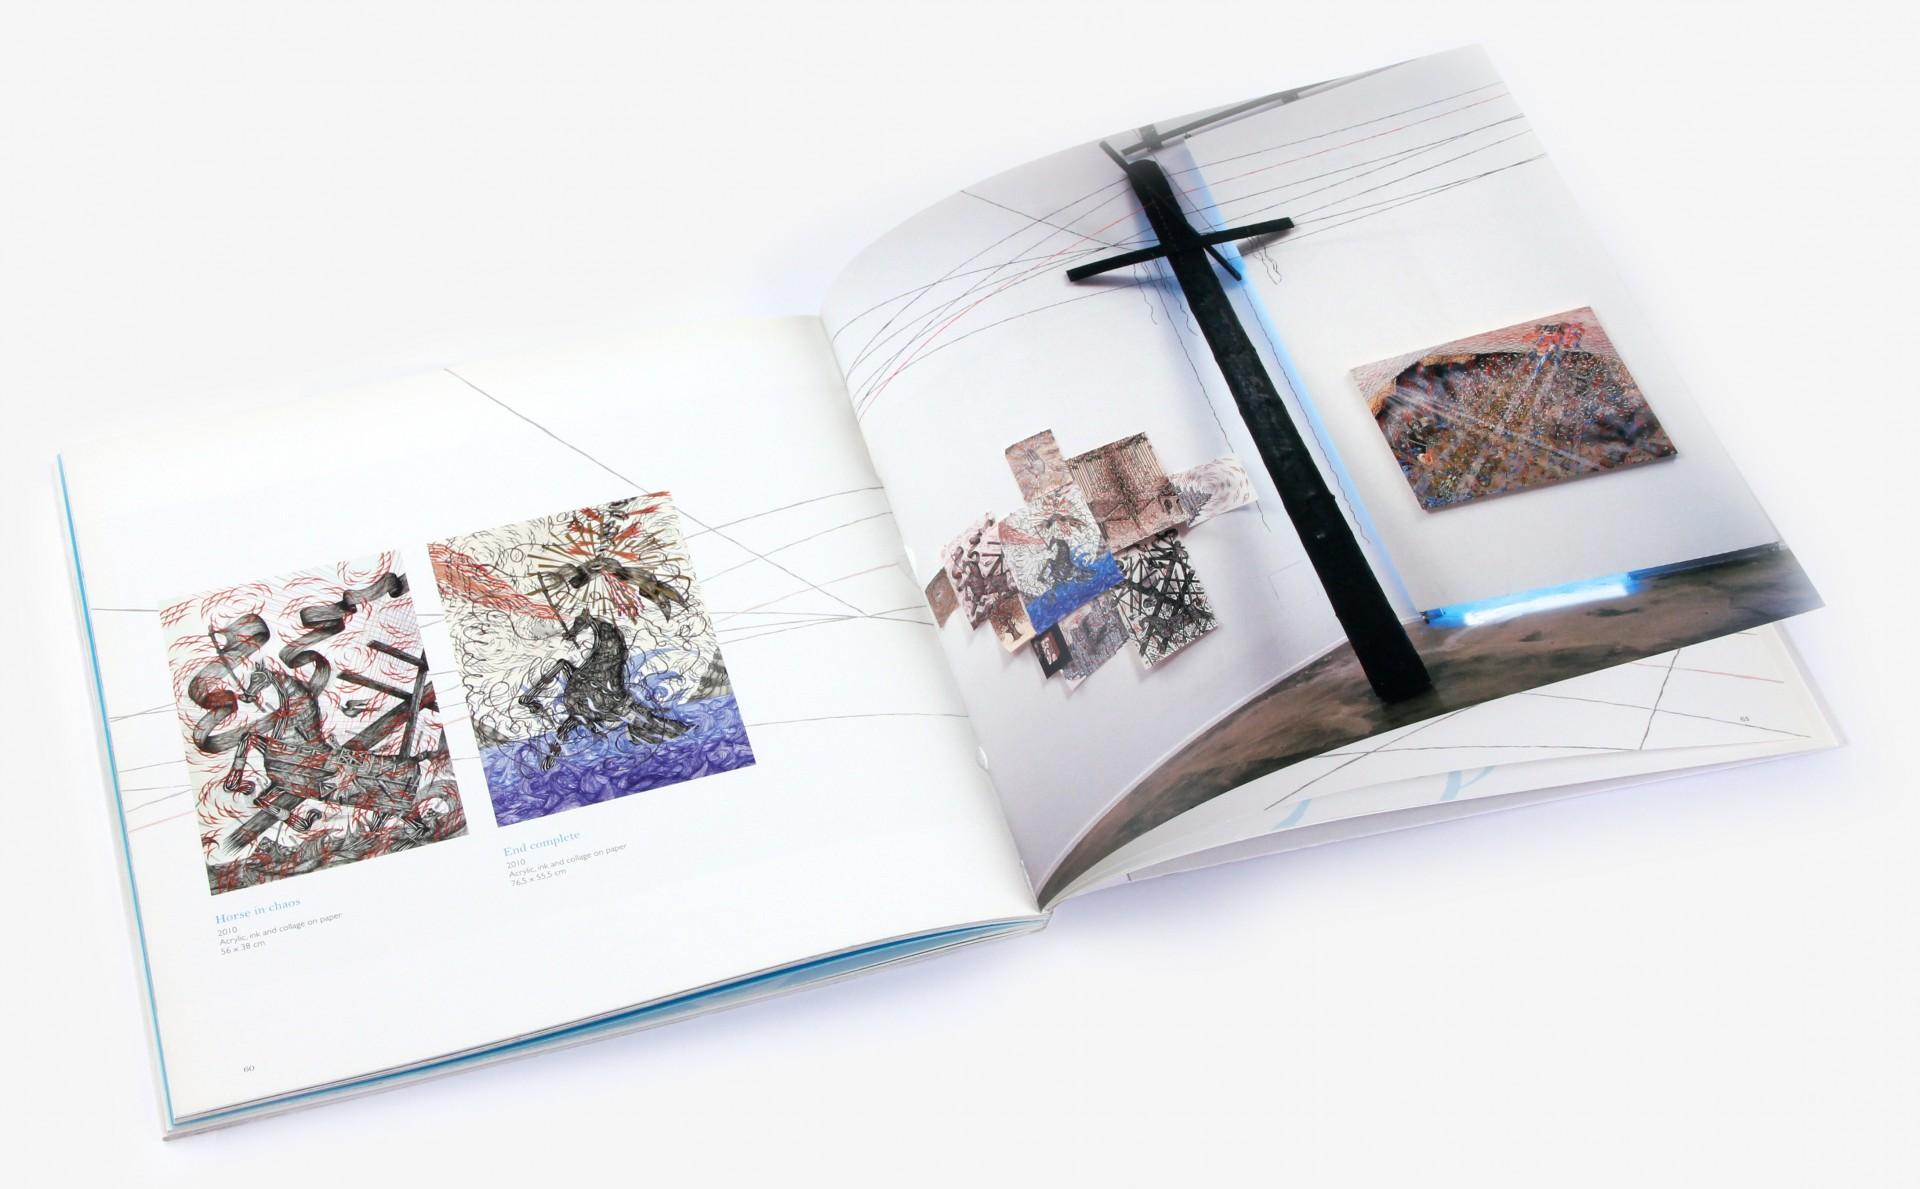 Andrew Shoultz - Crisis - Catalogo artista - intenro